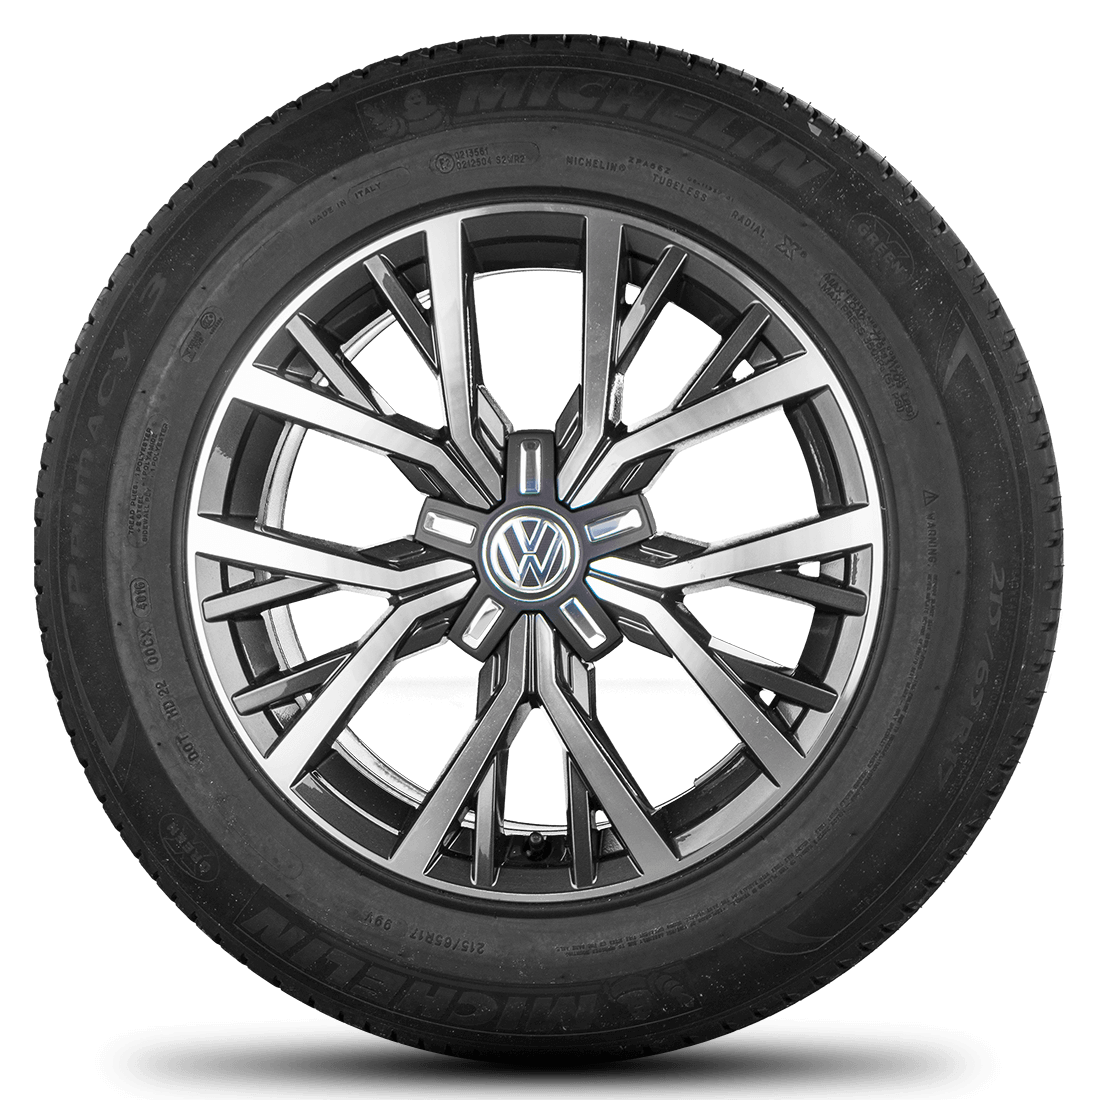 VW Tiguan 2 II 5NA 17 inch summer tires alloy wheels rim R line